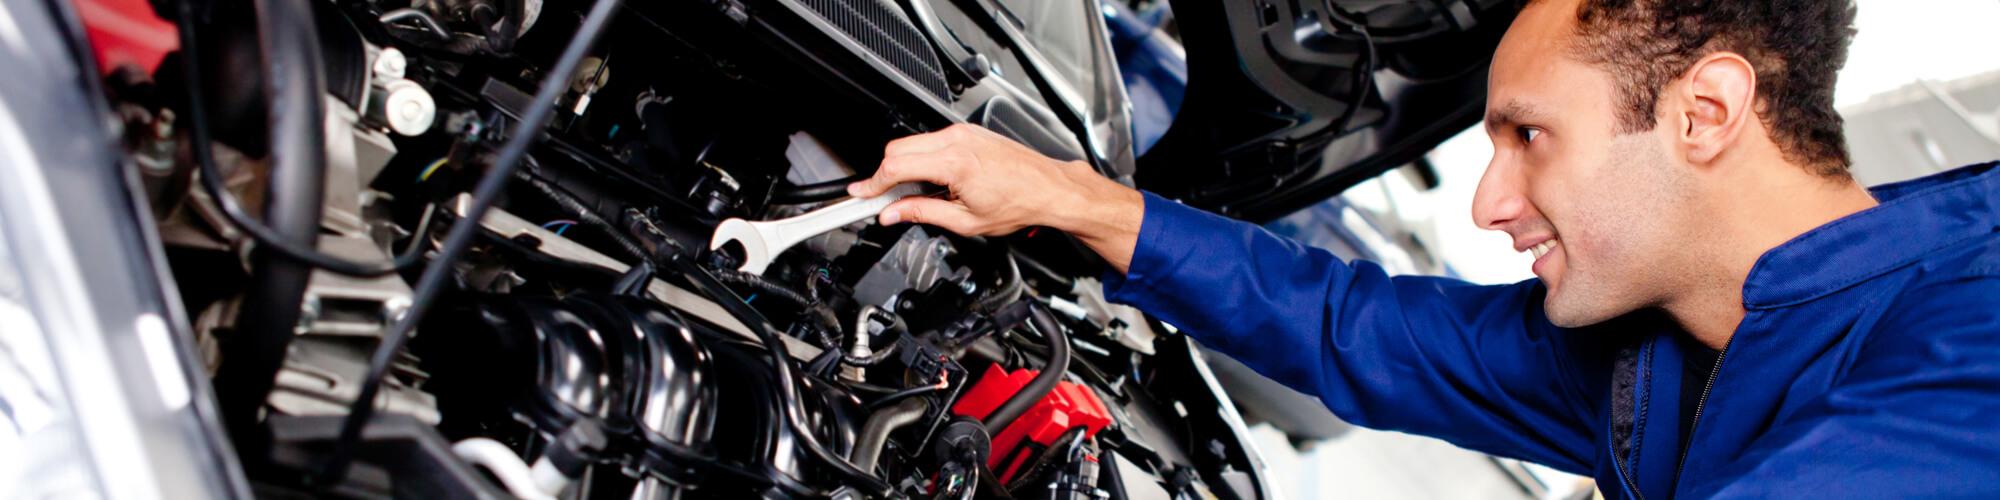 car repairs tilehurst